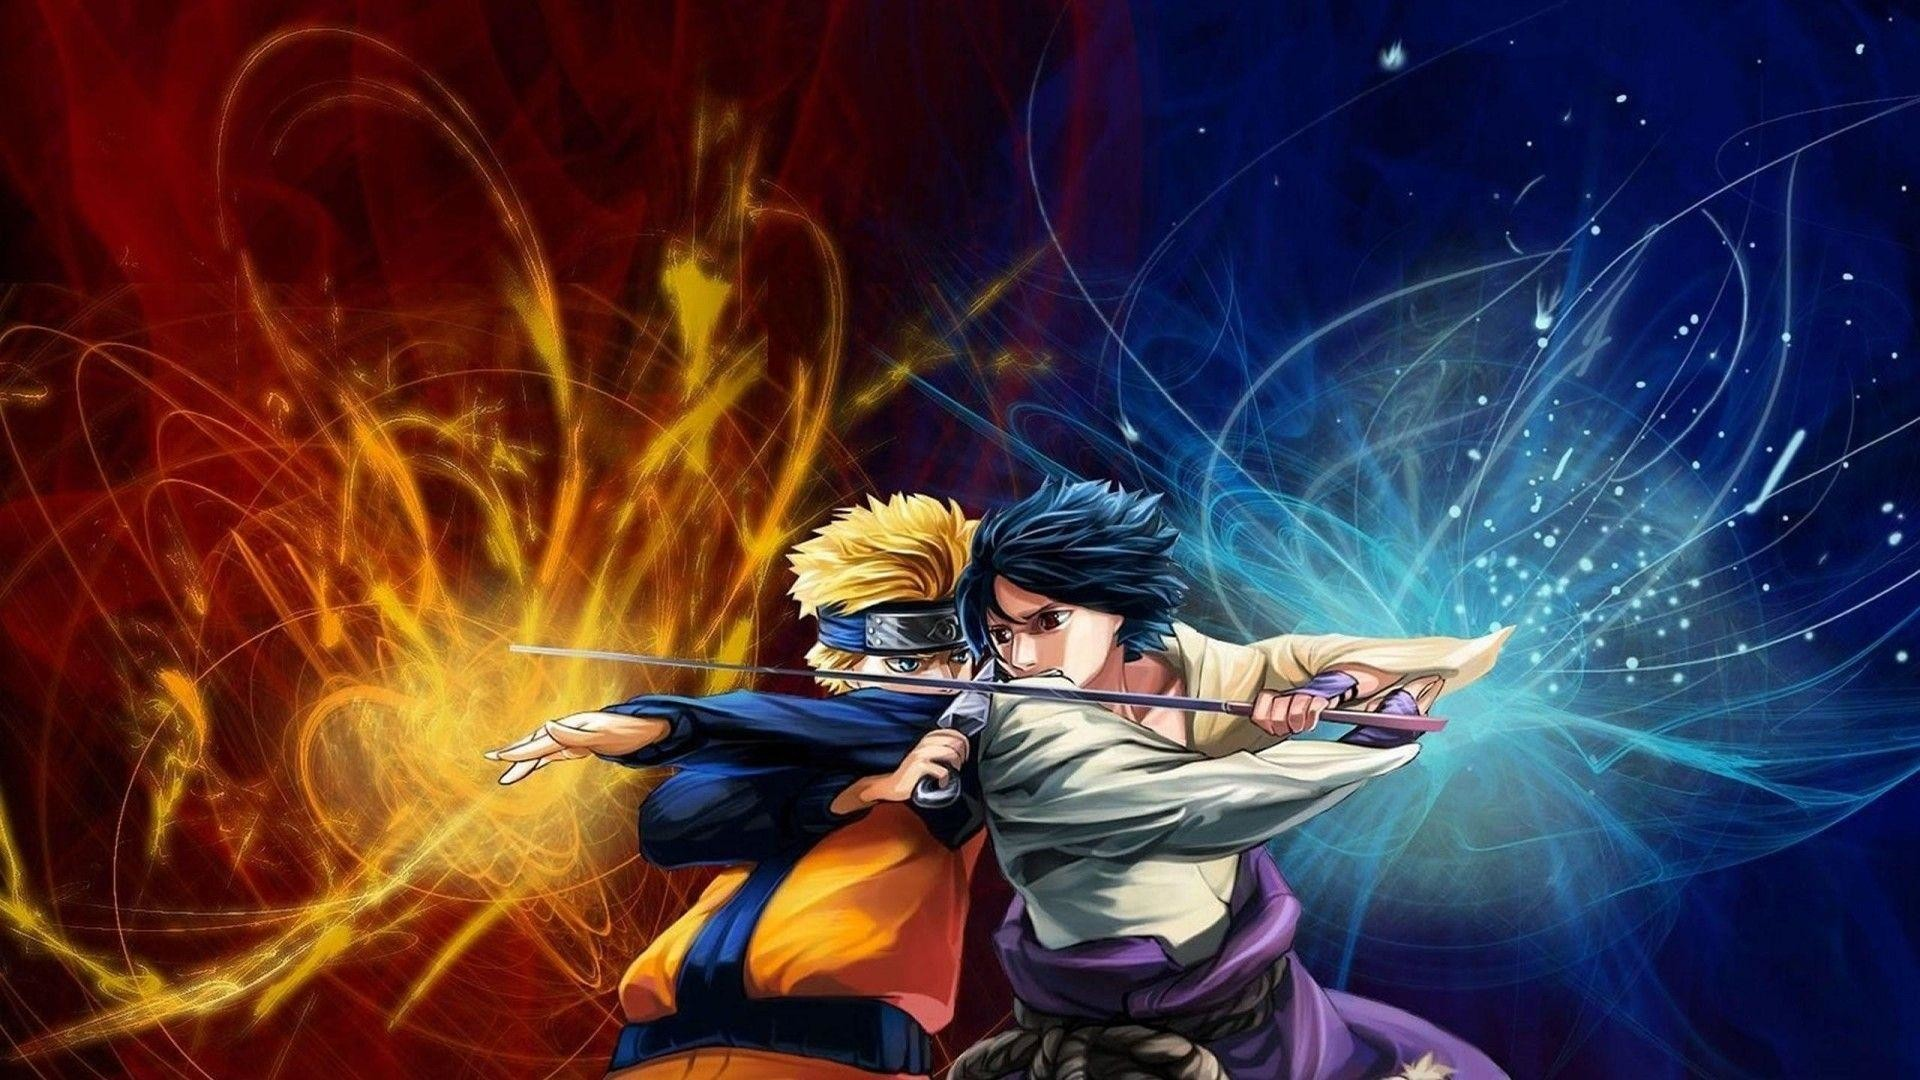 Naruto Wallpapers HD 2018 (63+ images)